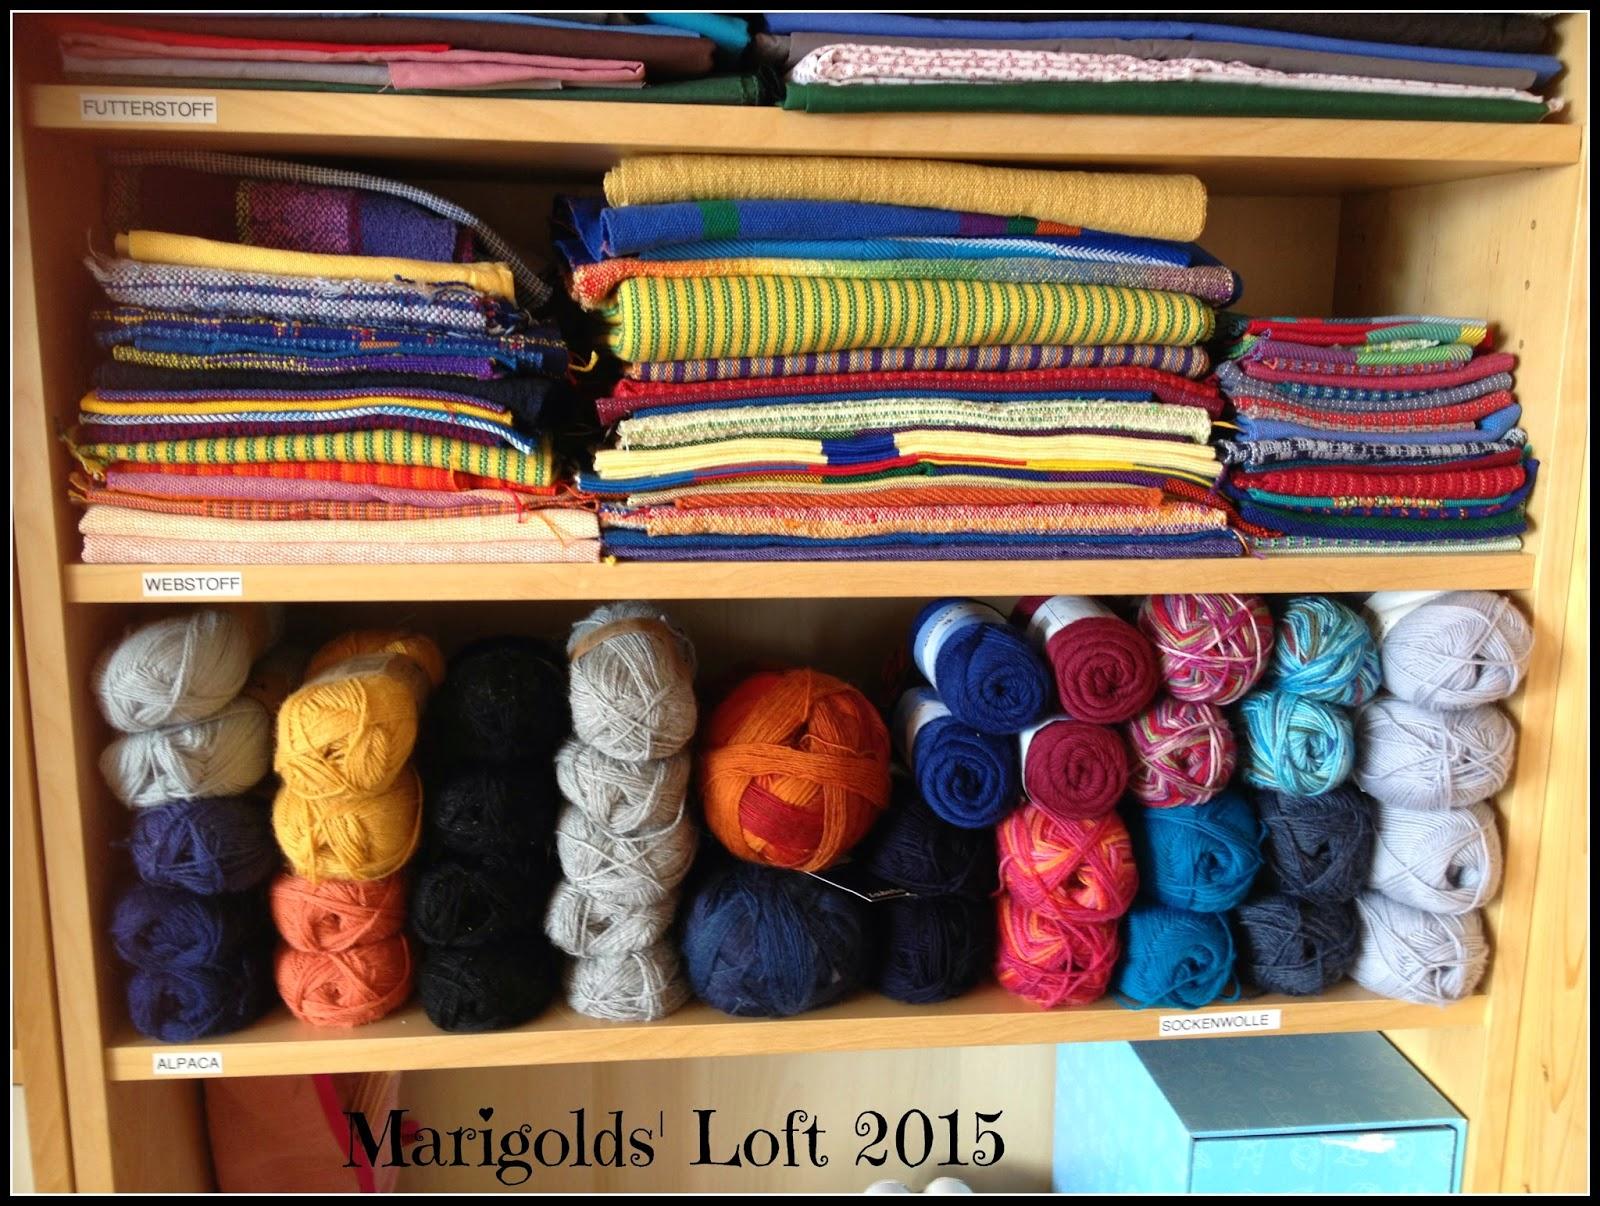 Weaving cloth and knitting yarn